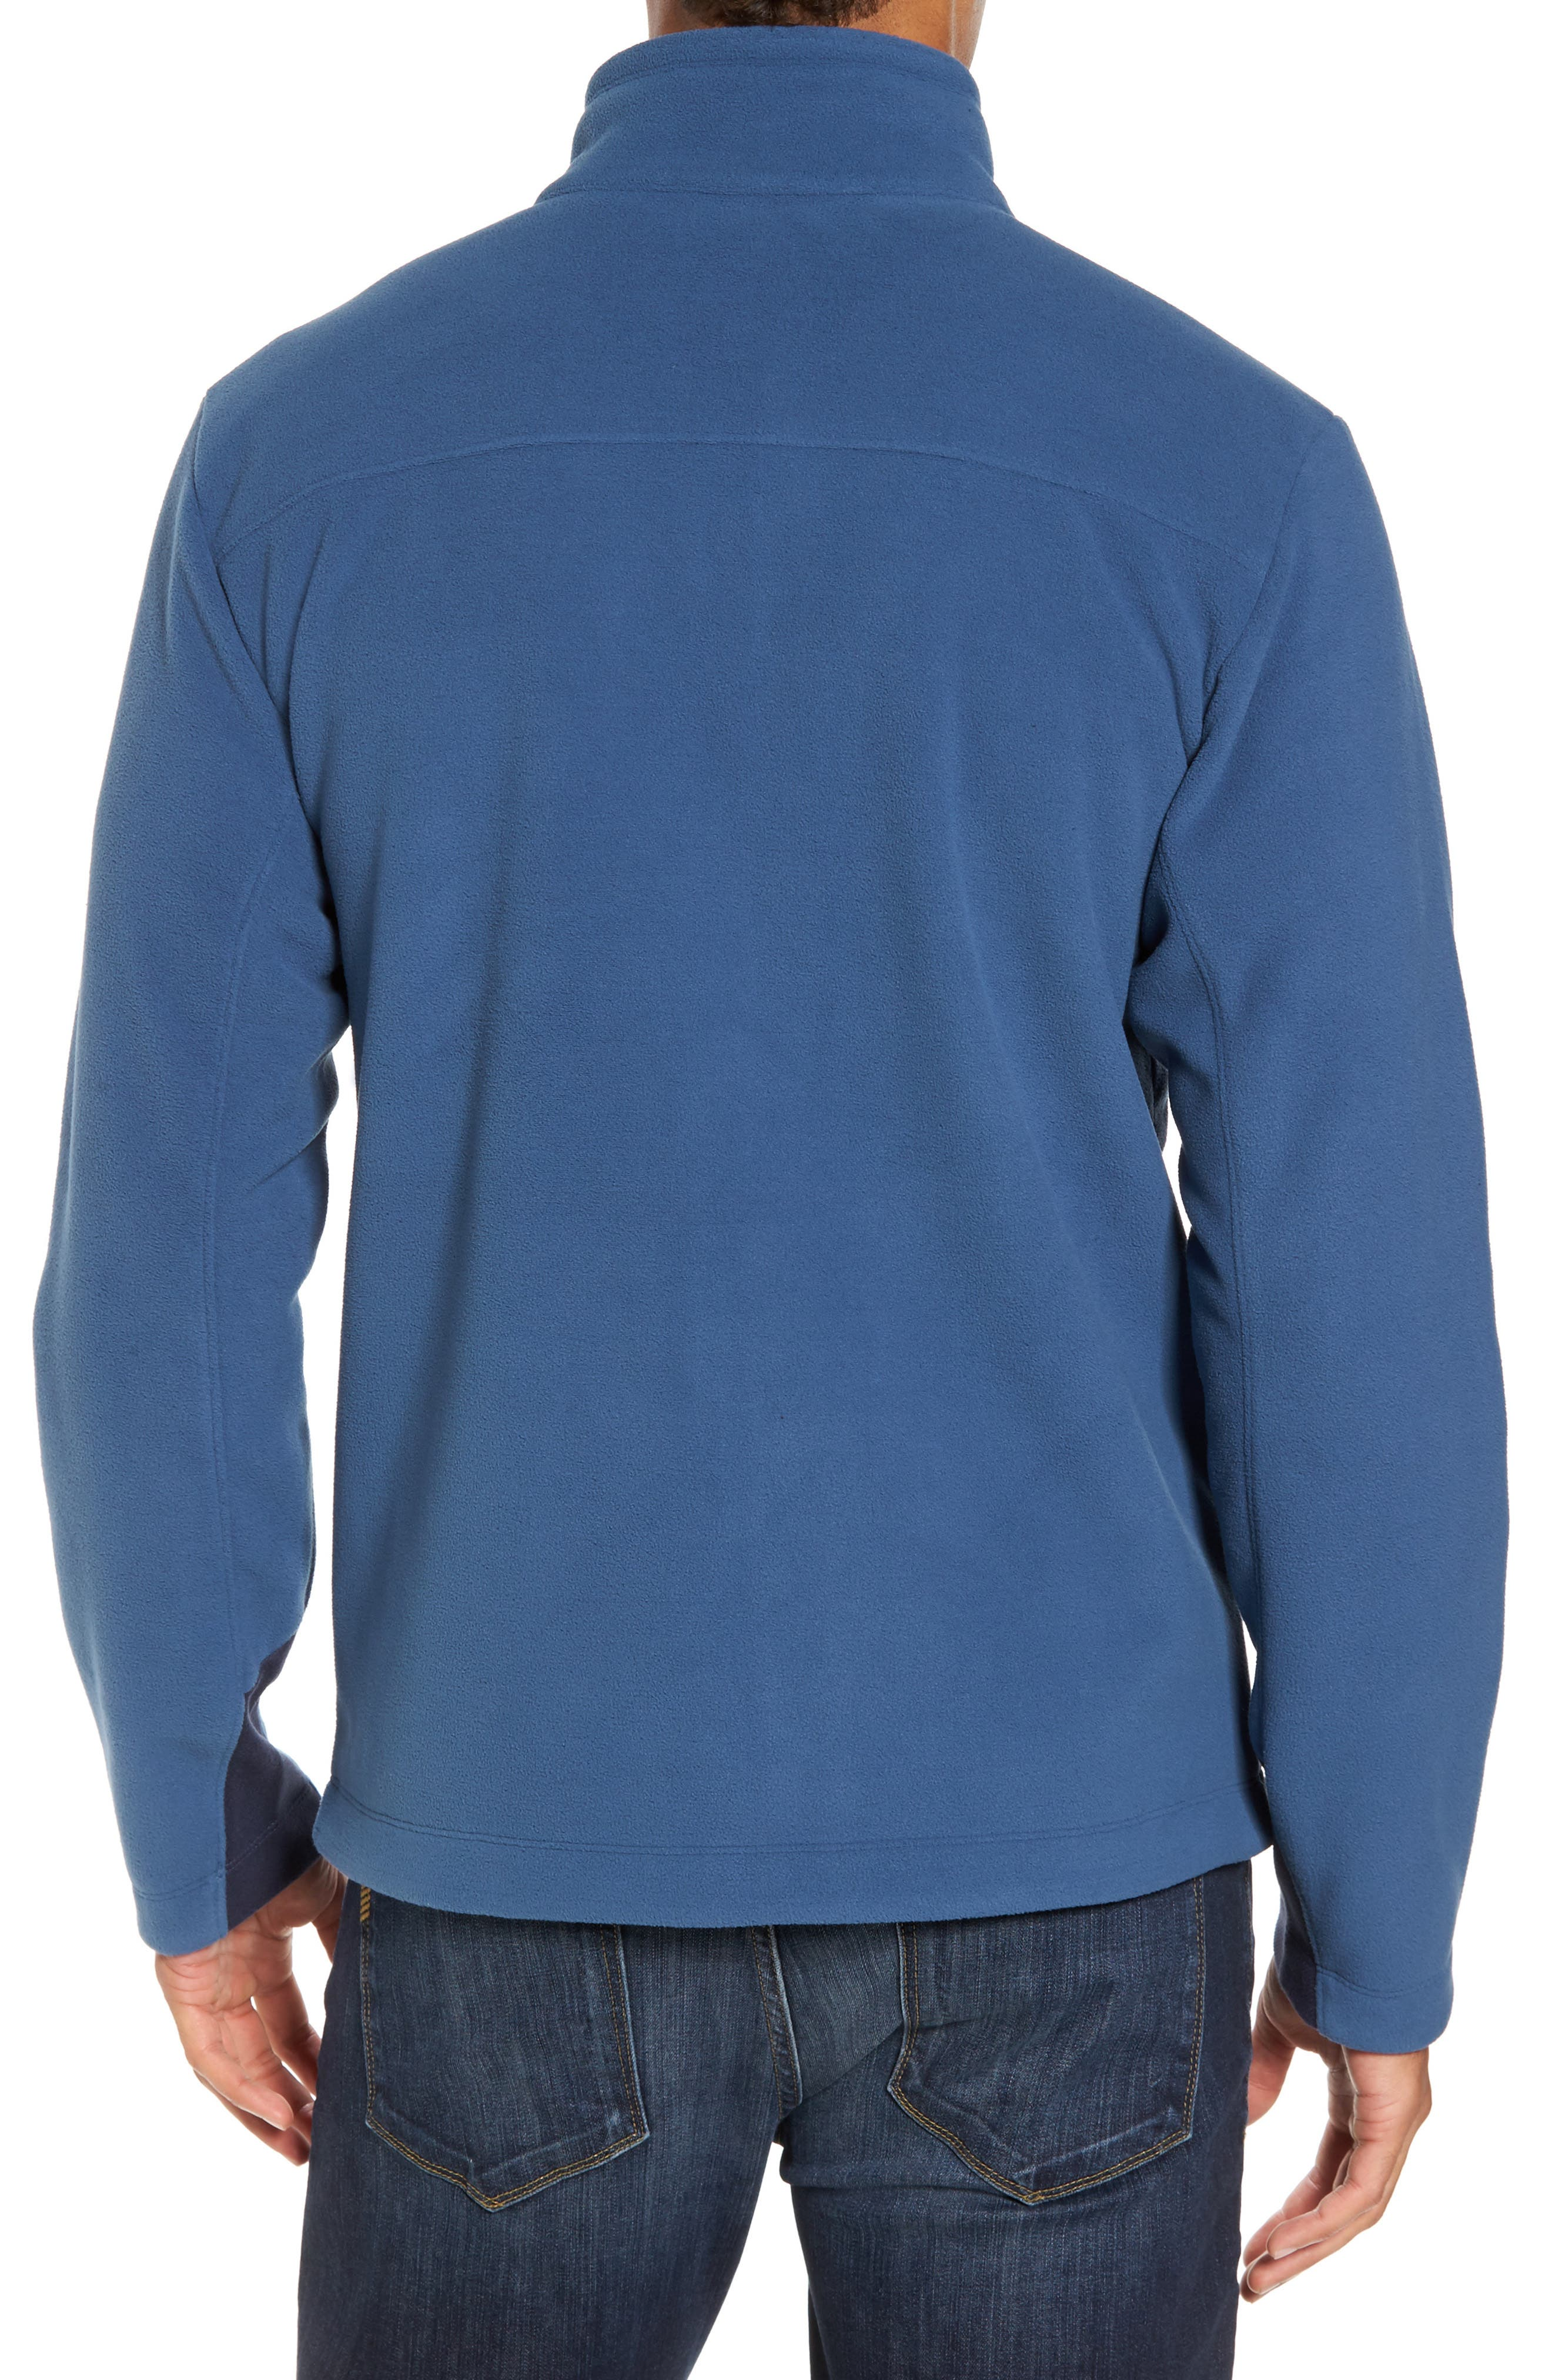 'Chimborazo' Zip Front Fleece Jacket,                             Alternate thumbnail 19, color,